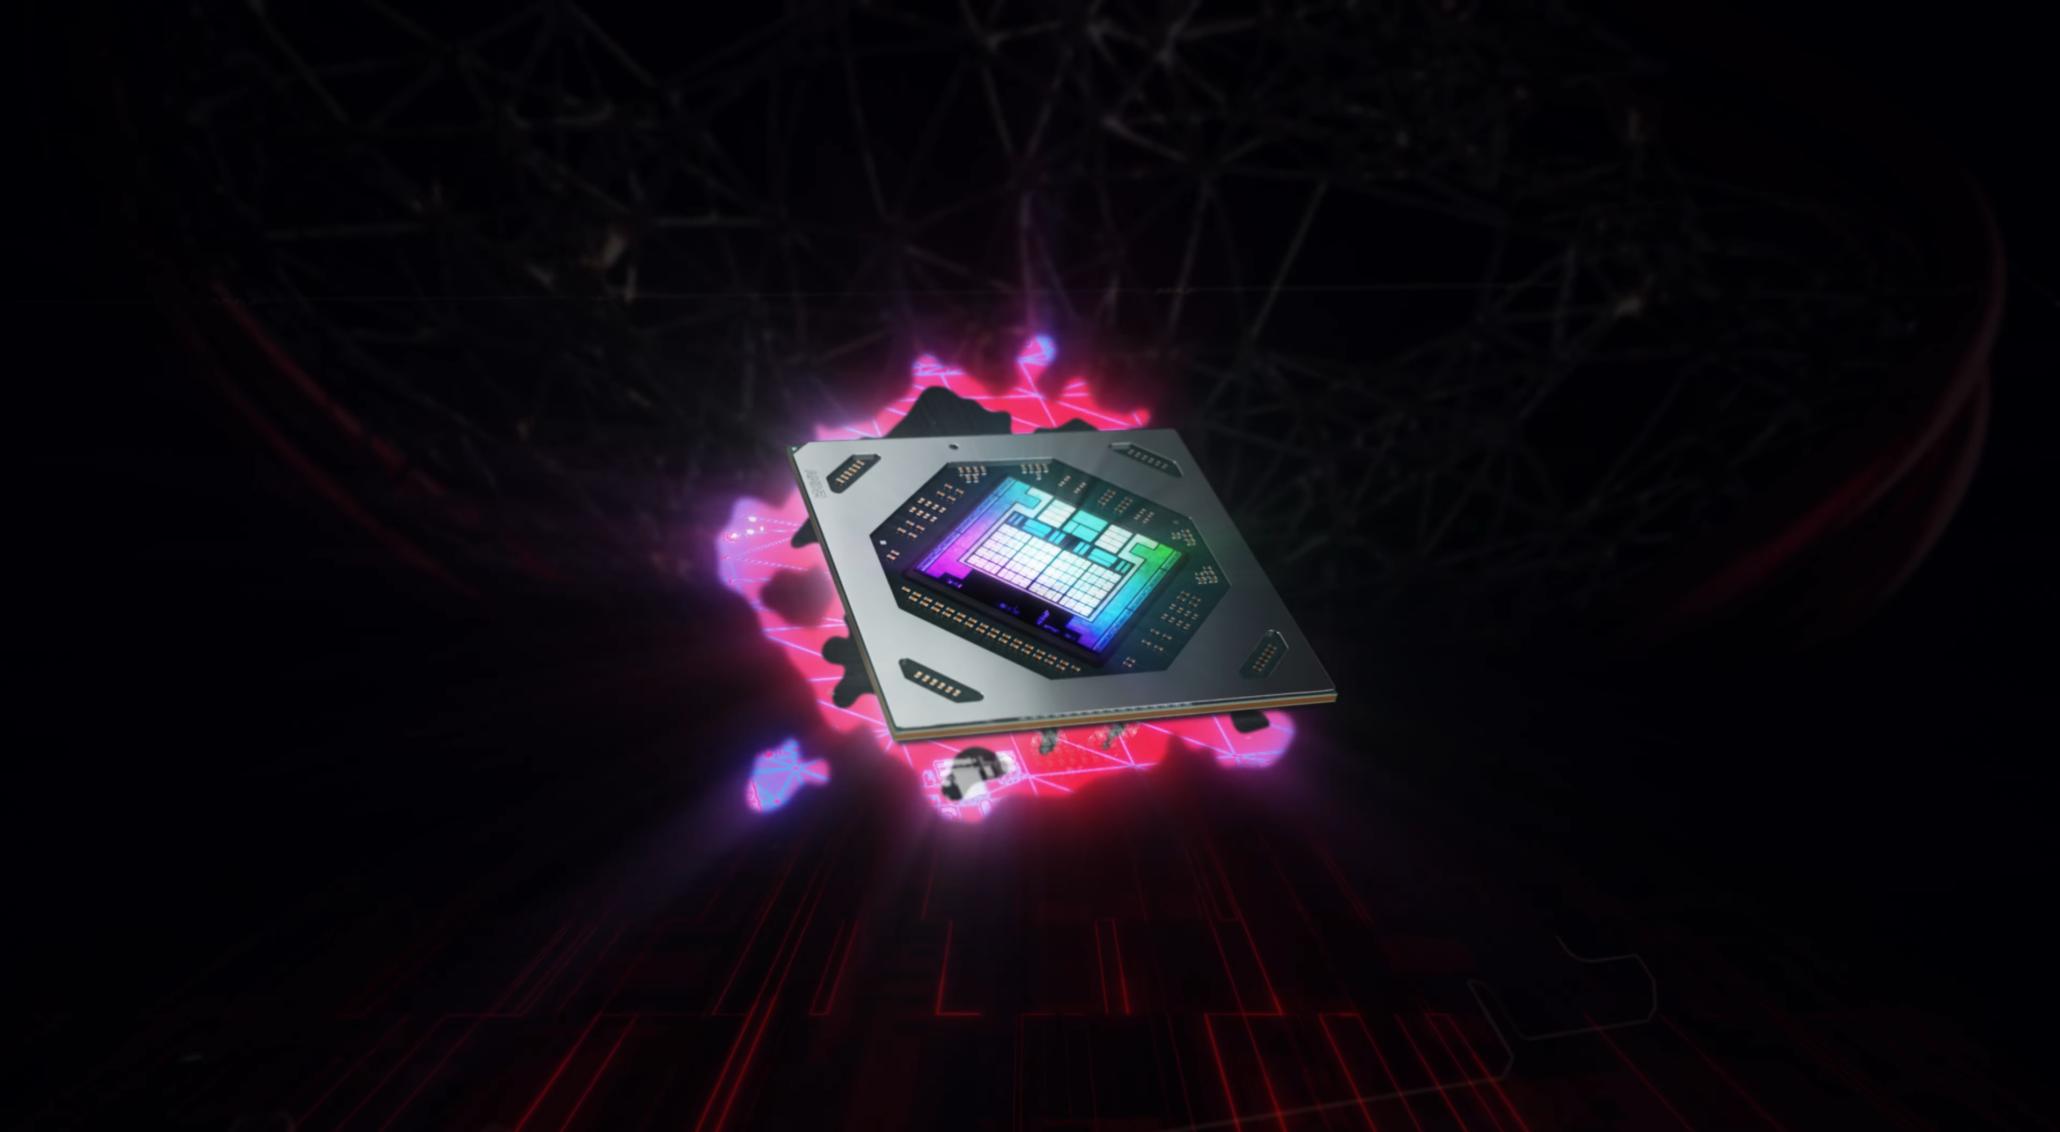 AMD Radeon RX 6600M & Radeon Pro W6600M RDNA 2 Chips Akan Menampilkan Navi 23 GPU